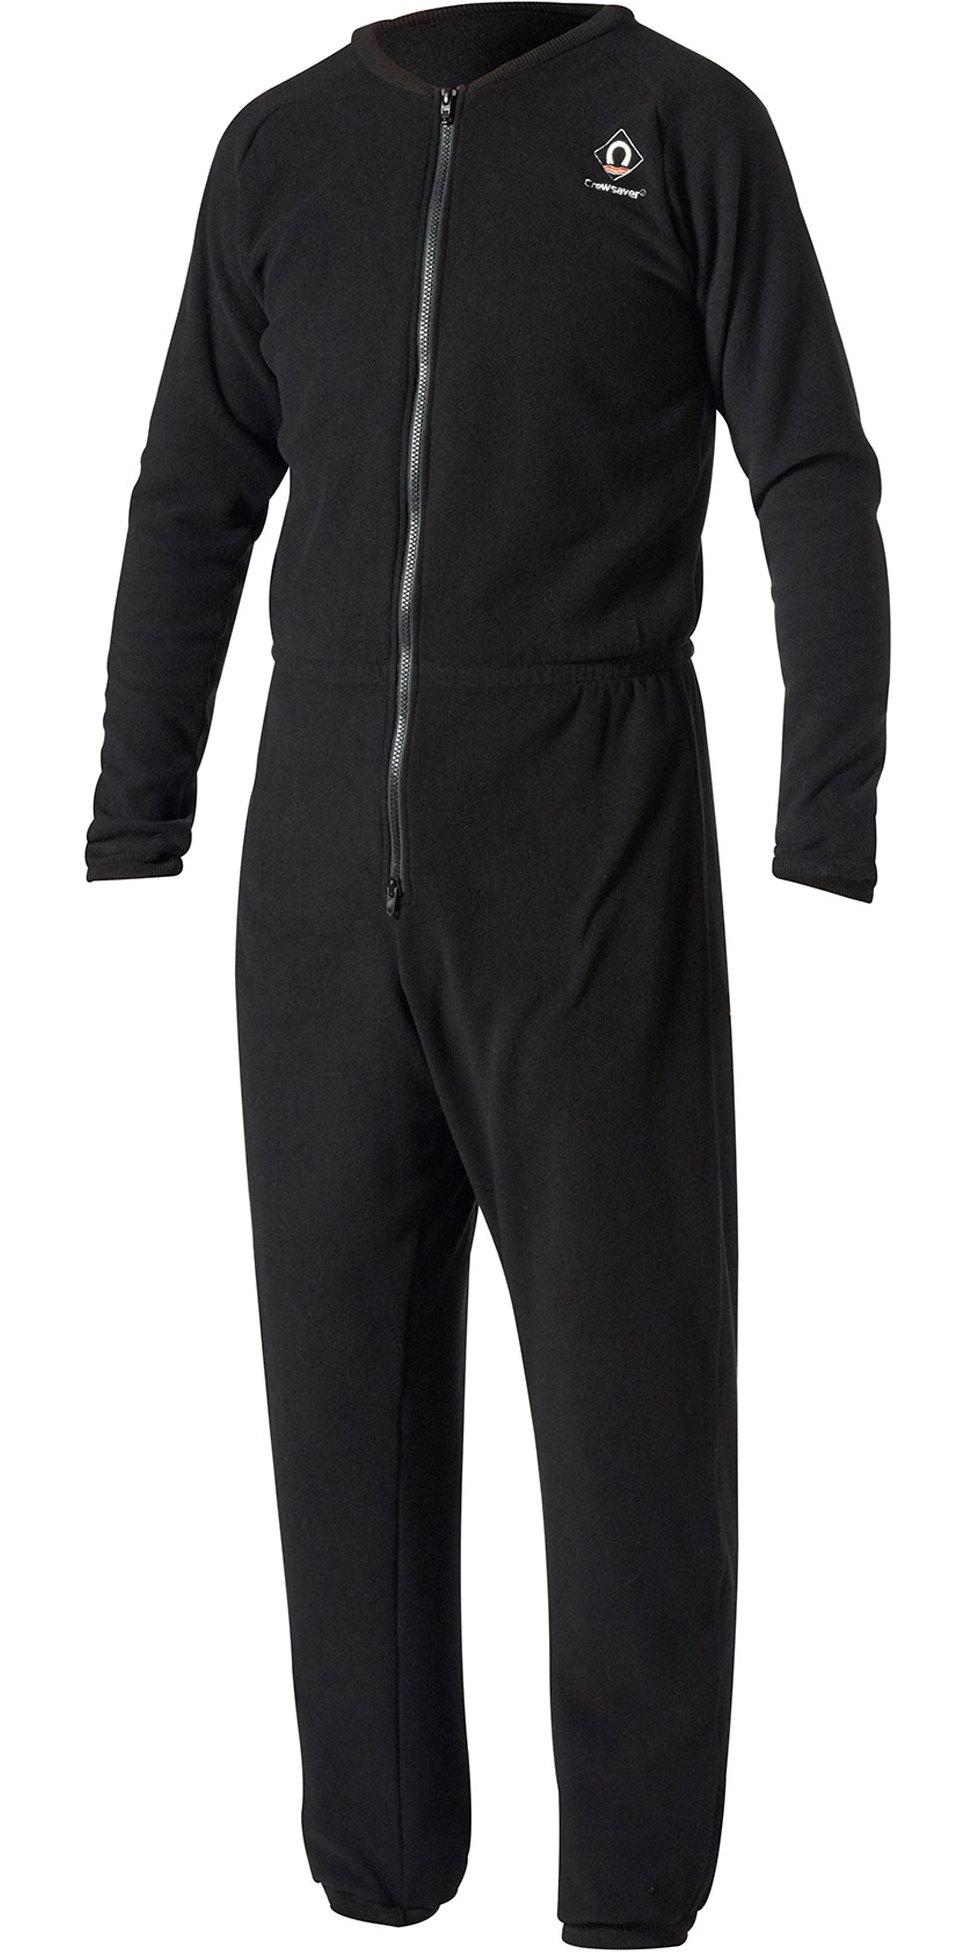 2019 Crewsaver Atacama Sport Drysuit INCLUDING UNDERSUIT RED / BLACK 6555